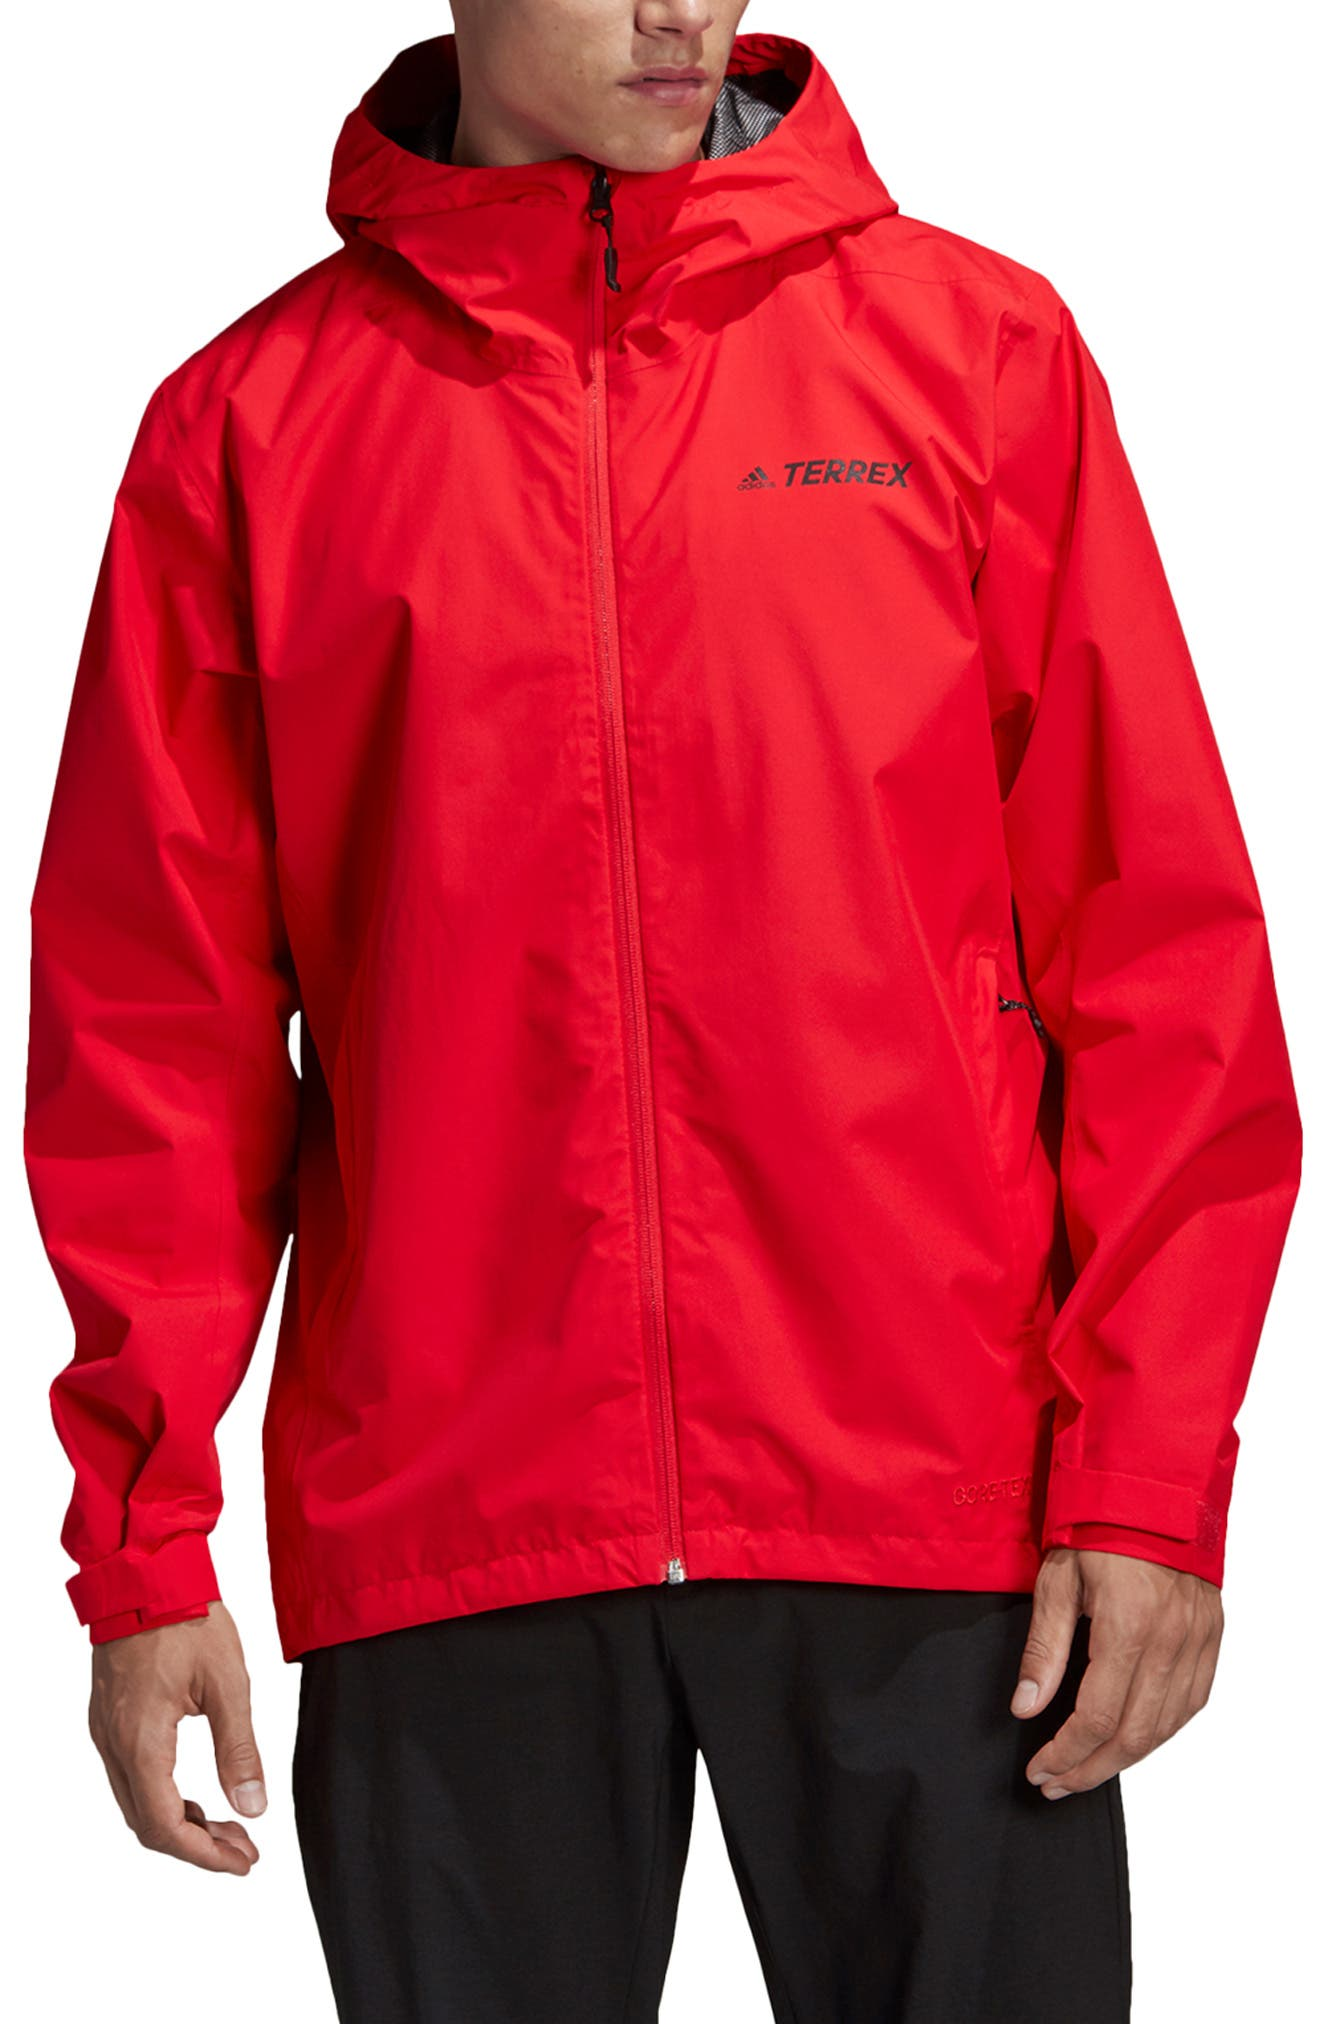 Adidas Terrex Gtx Gore-Tex Rain Jacket